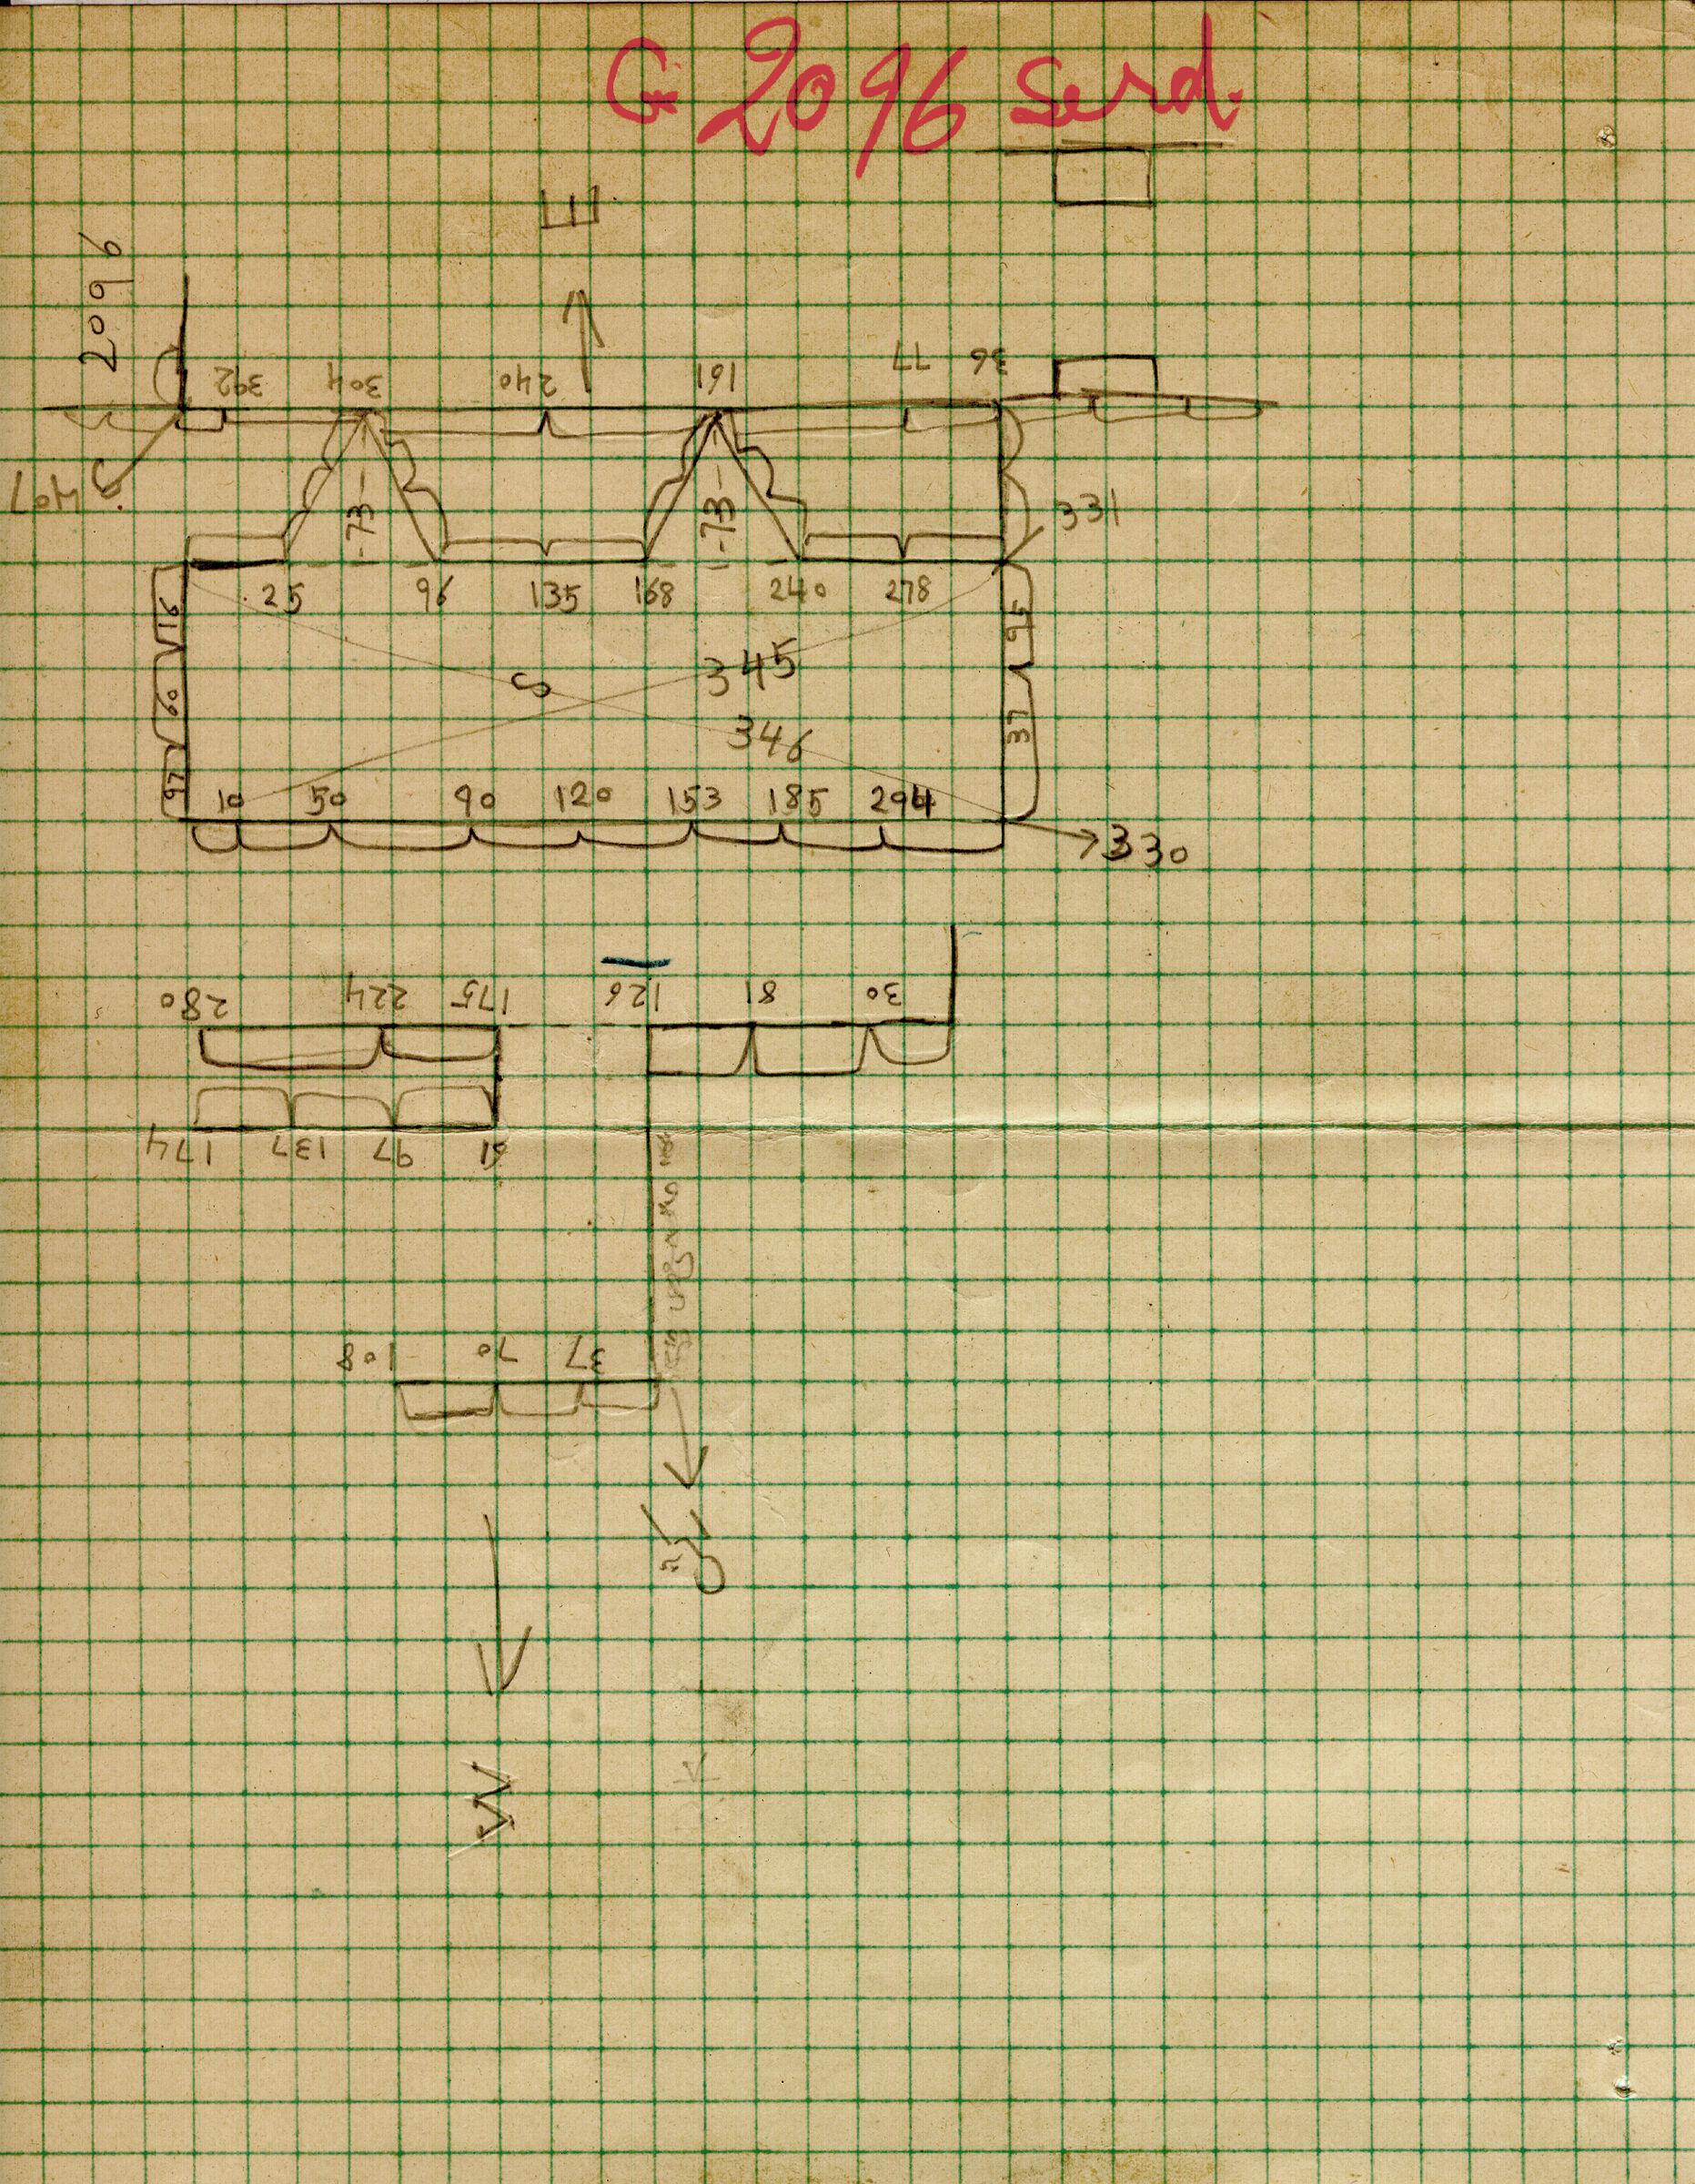 Maps and plans: G 2096, Serdab